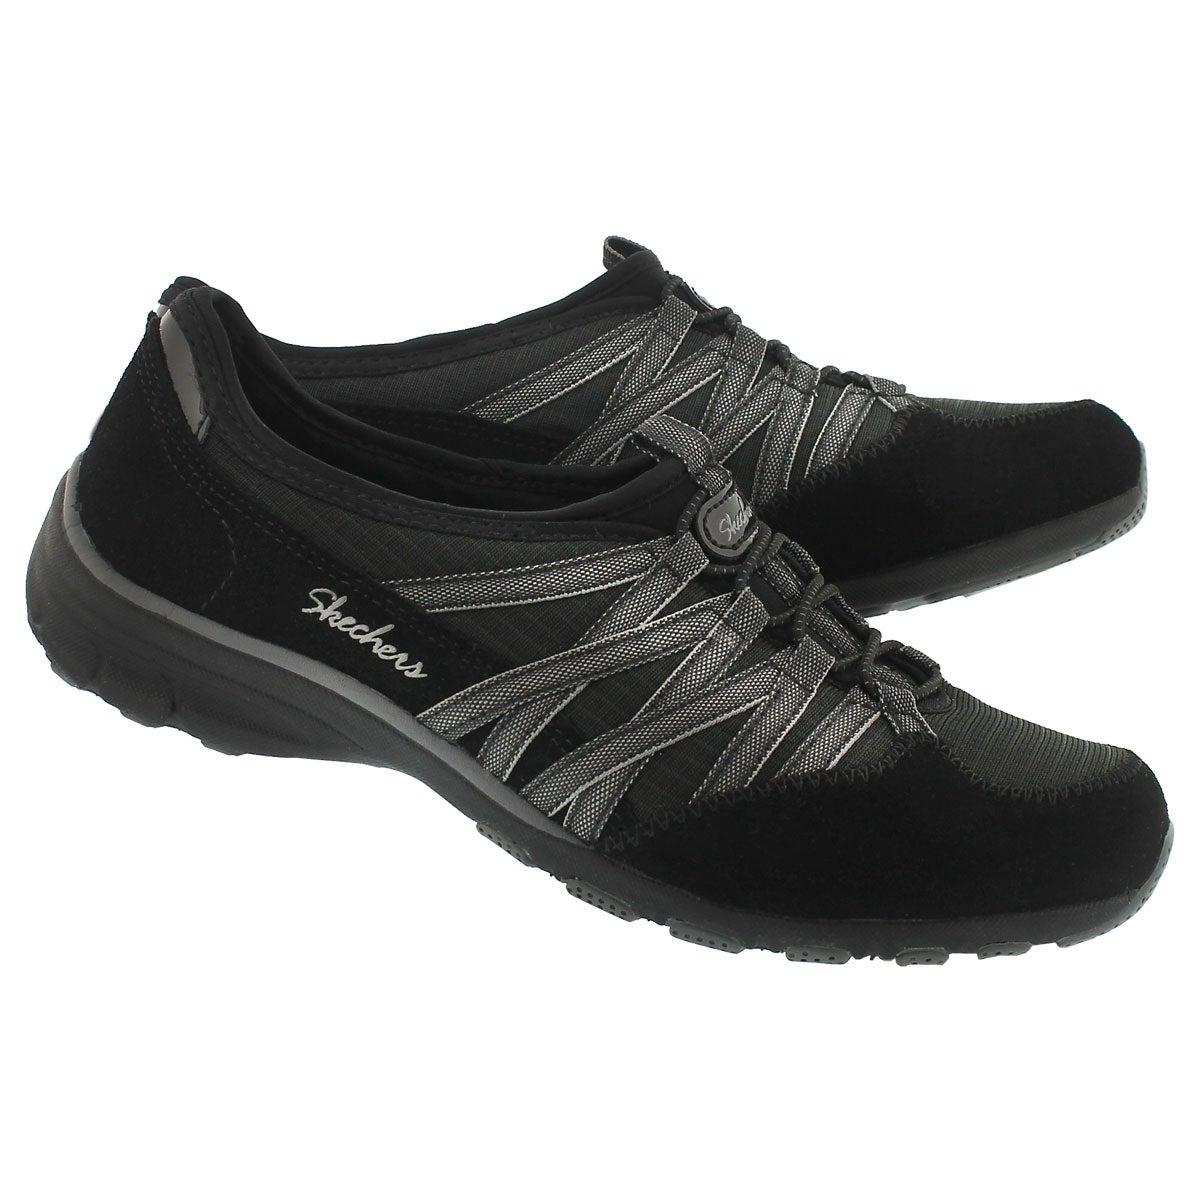 Lds Holding Aces blk/char slipon sneaker